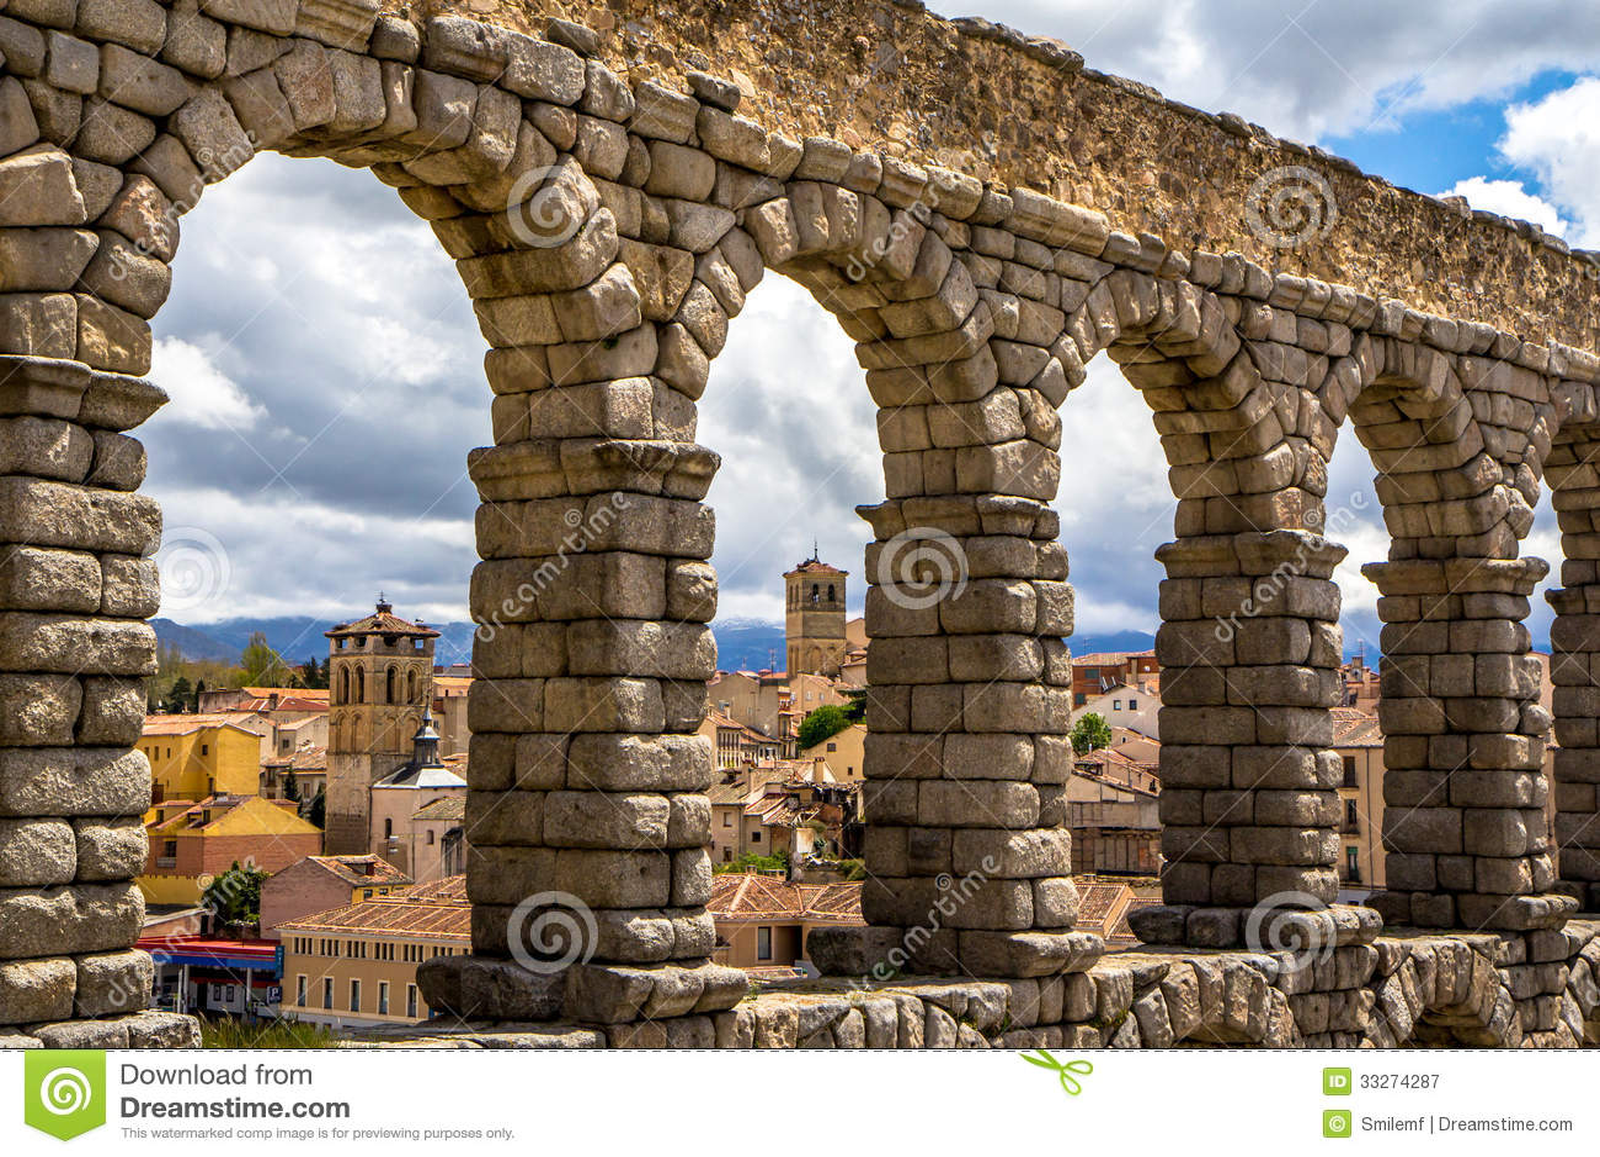 old town of segovia through the roman aqueduct royalty free stock